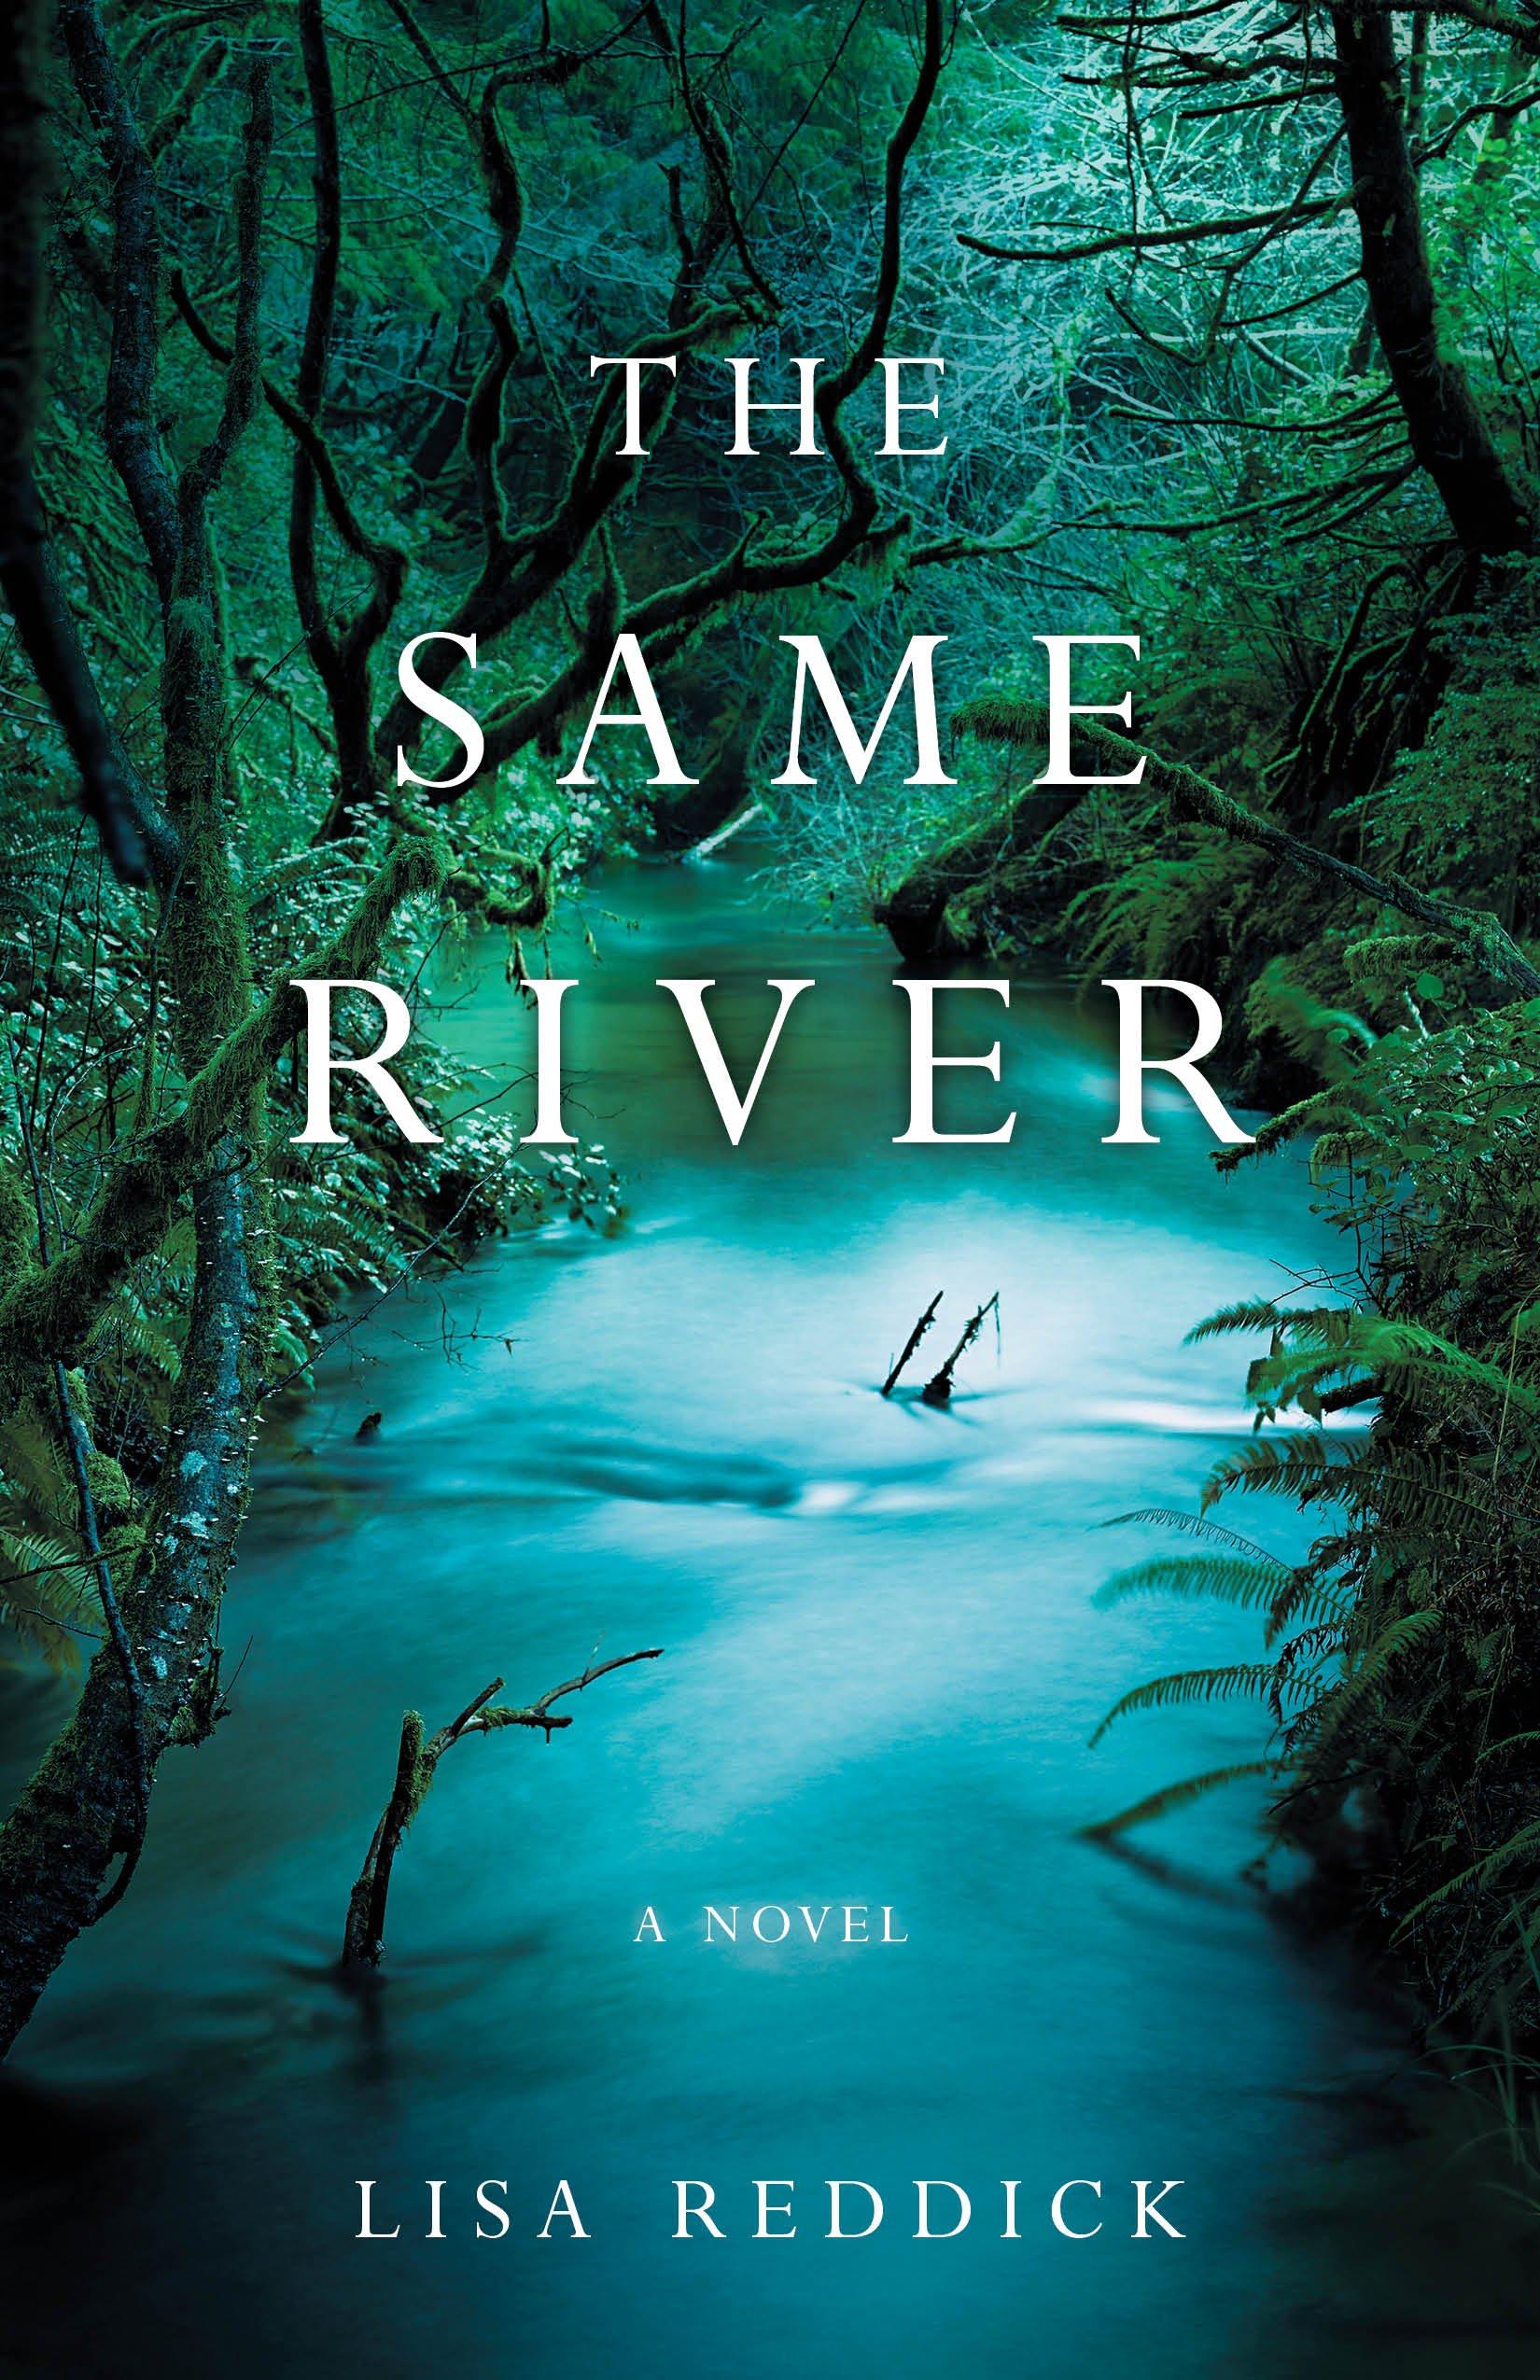 The Same River: A Novel